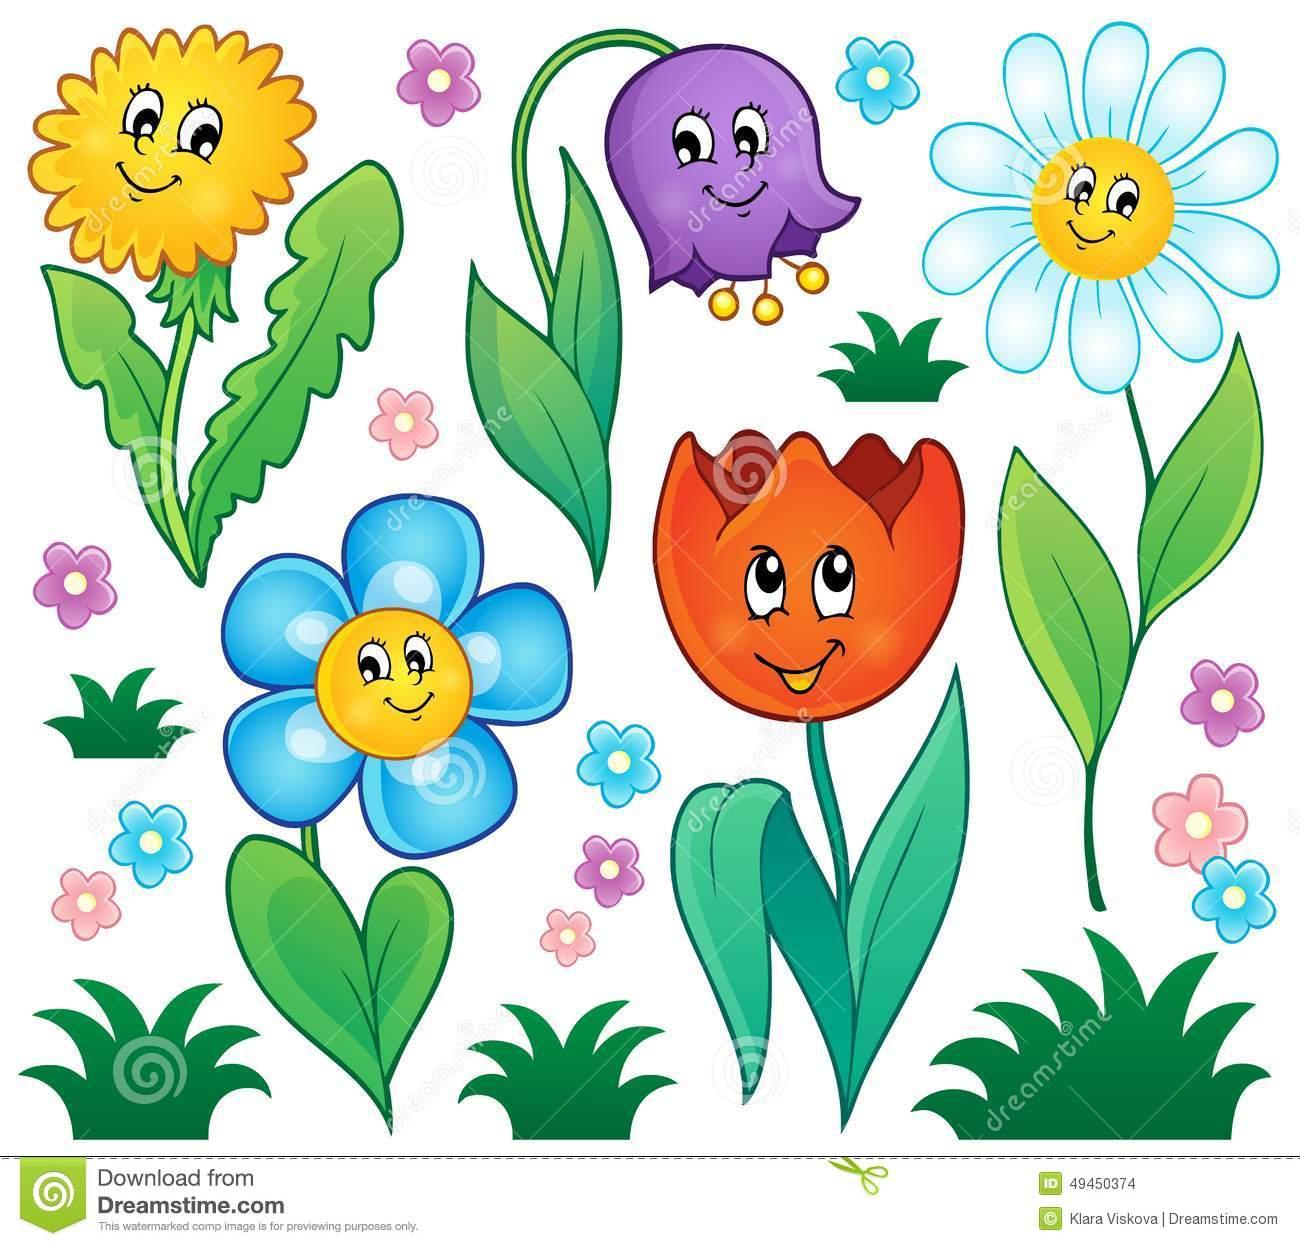 Photos of cartoon flowers clip art Cartoon Flowers Collection Stock Photography - Image: 29201162 clip art